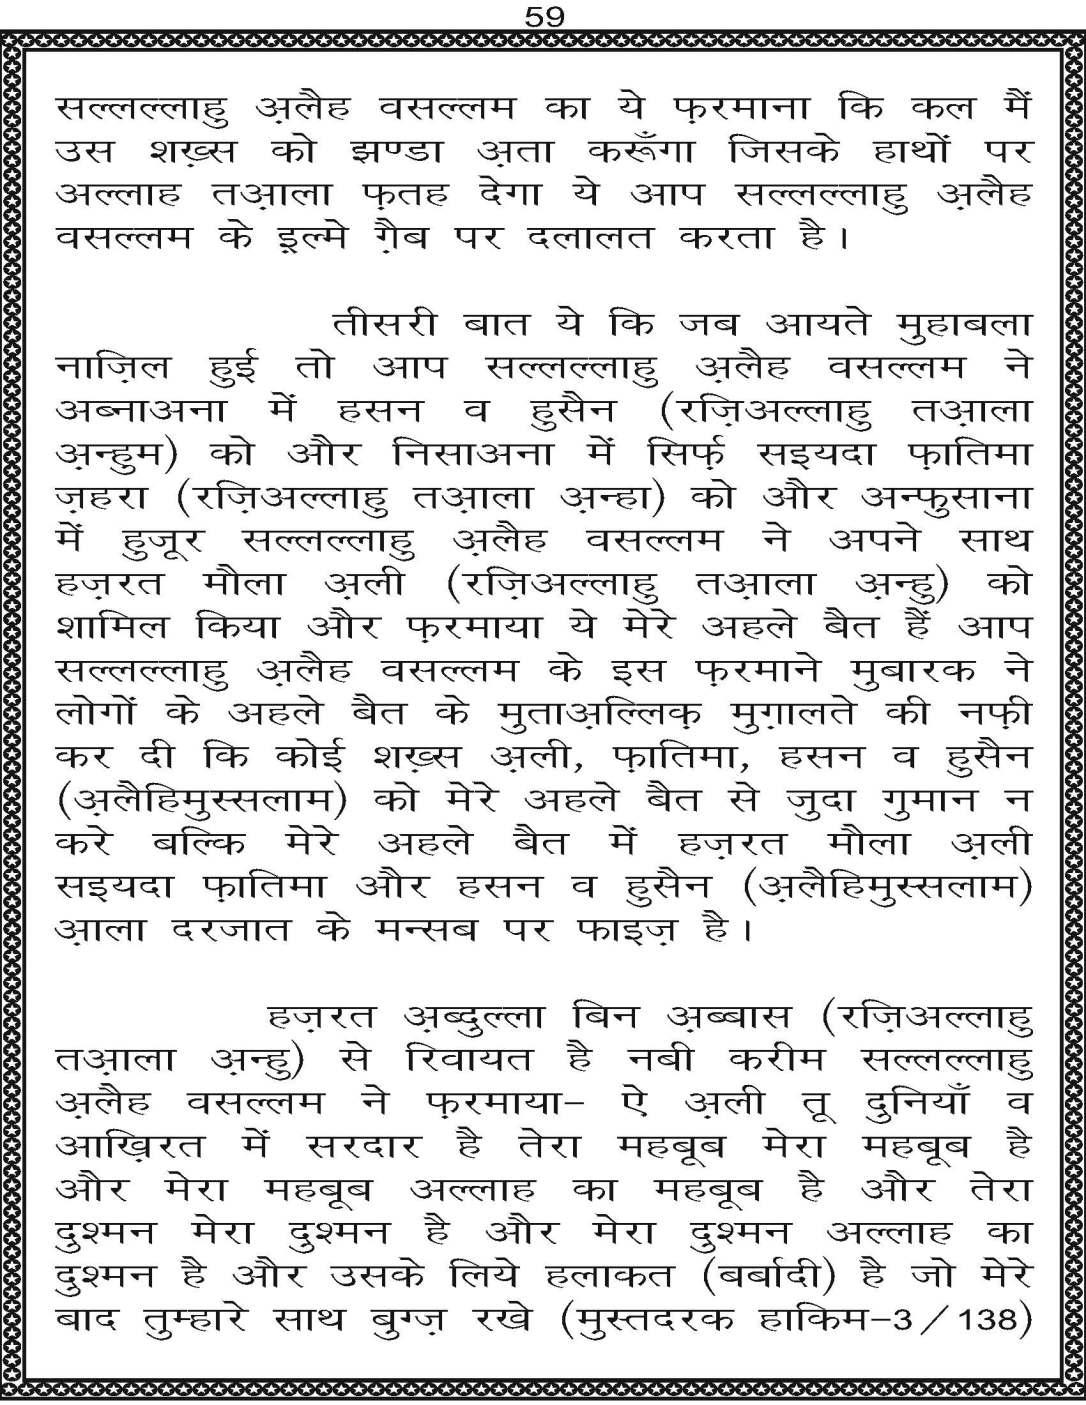 AzmateTaziyadari_Page_059